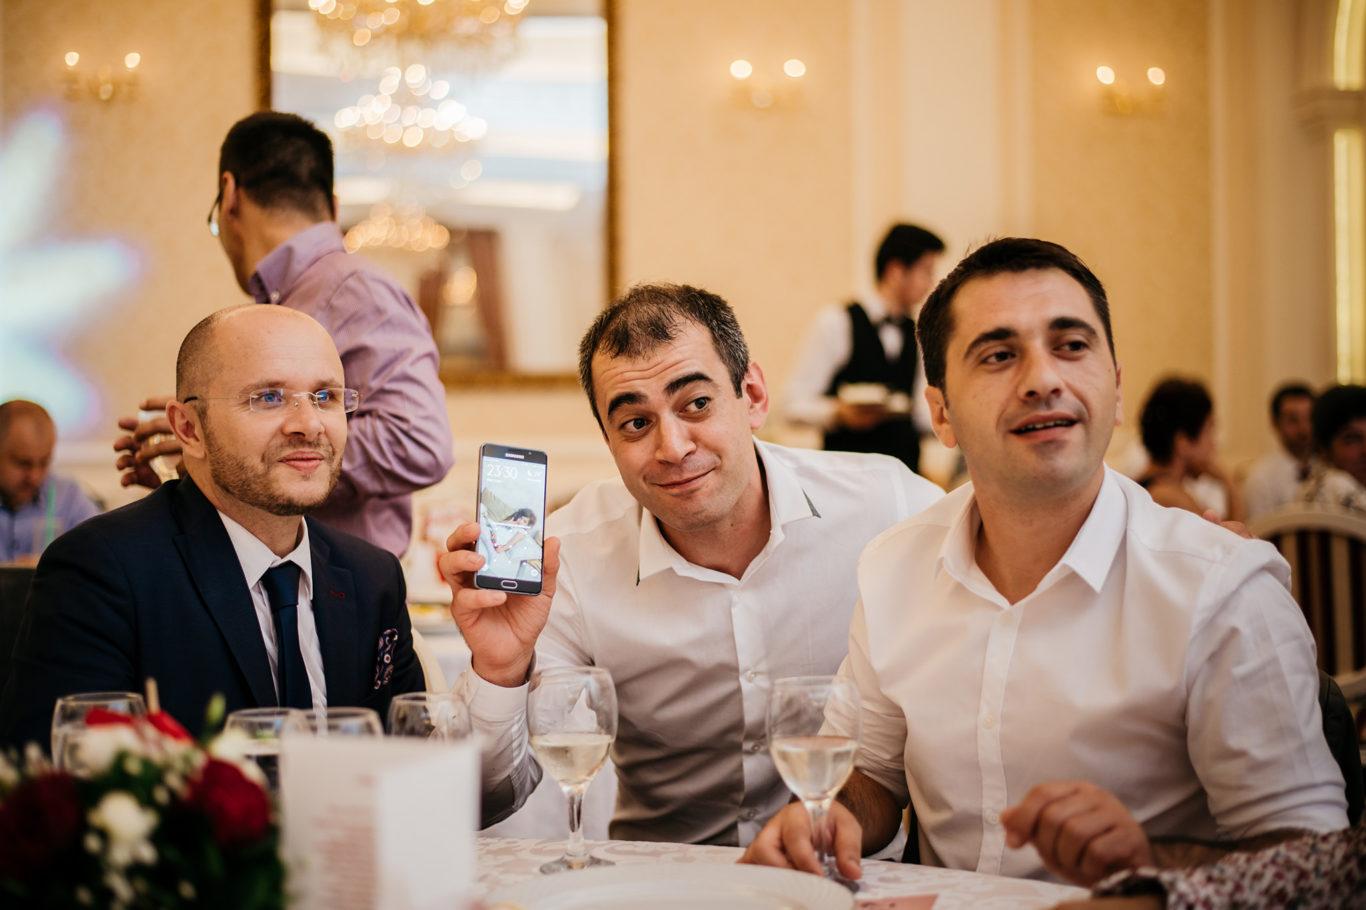 0682-fotografie-nunta-bucuresti-anca-george-fotograf-ciprian-dumitrescu-dsc_9539